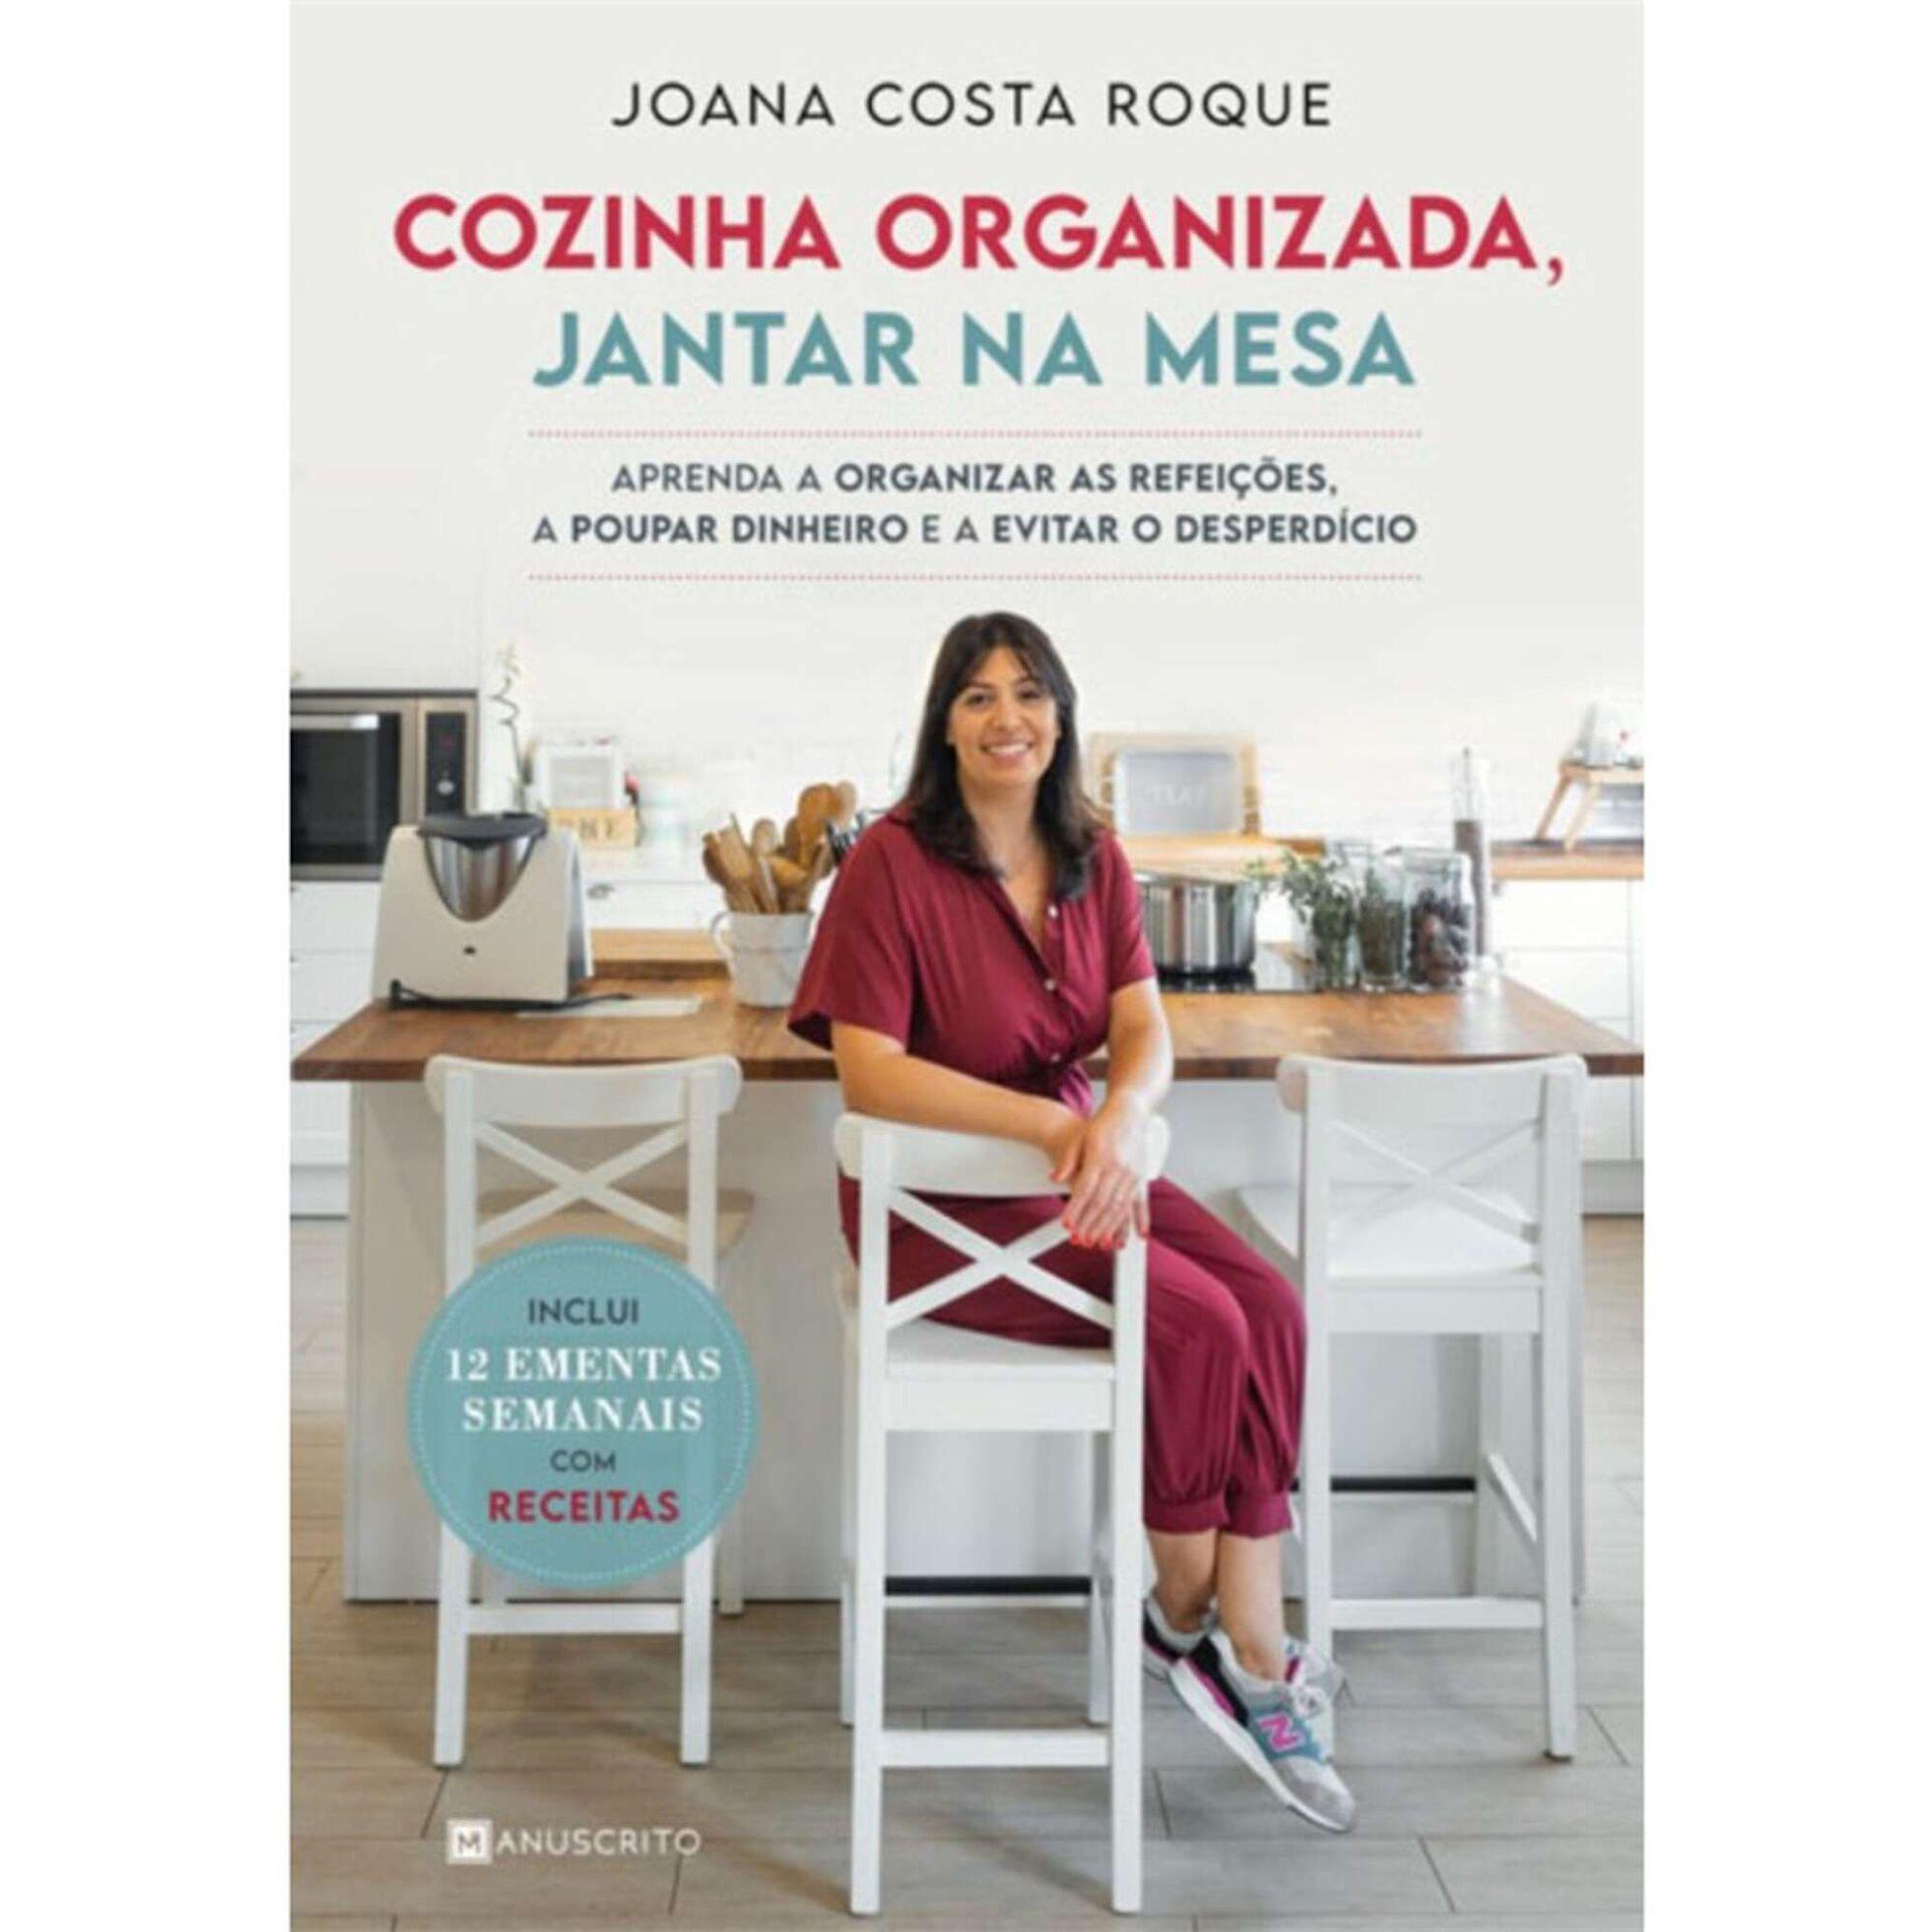 Cozinha Organizada, Jantar na Mesa